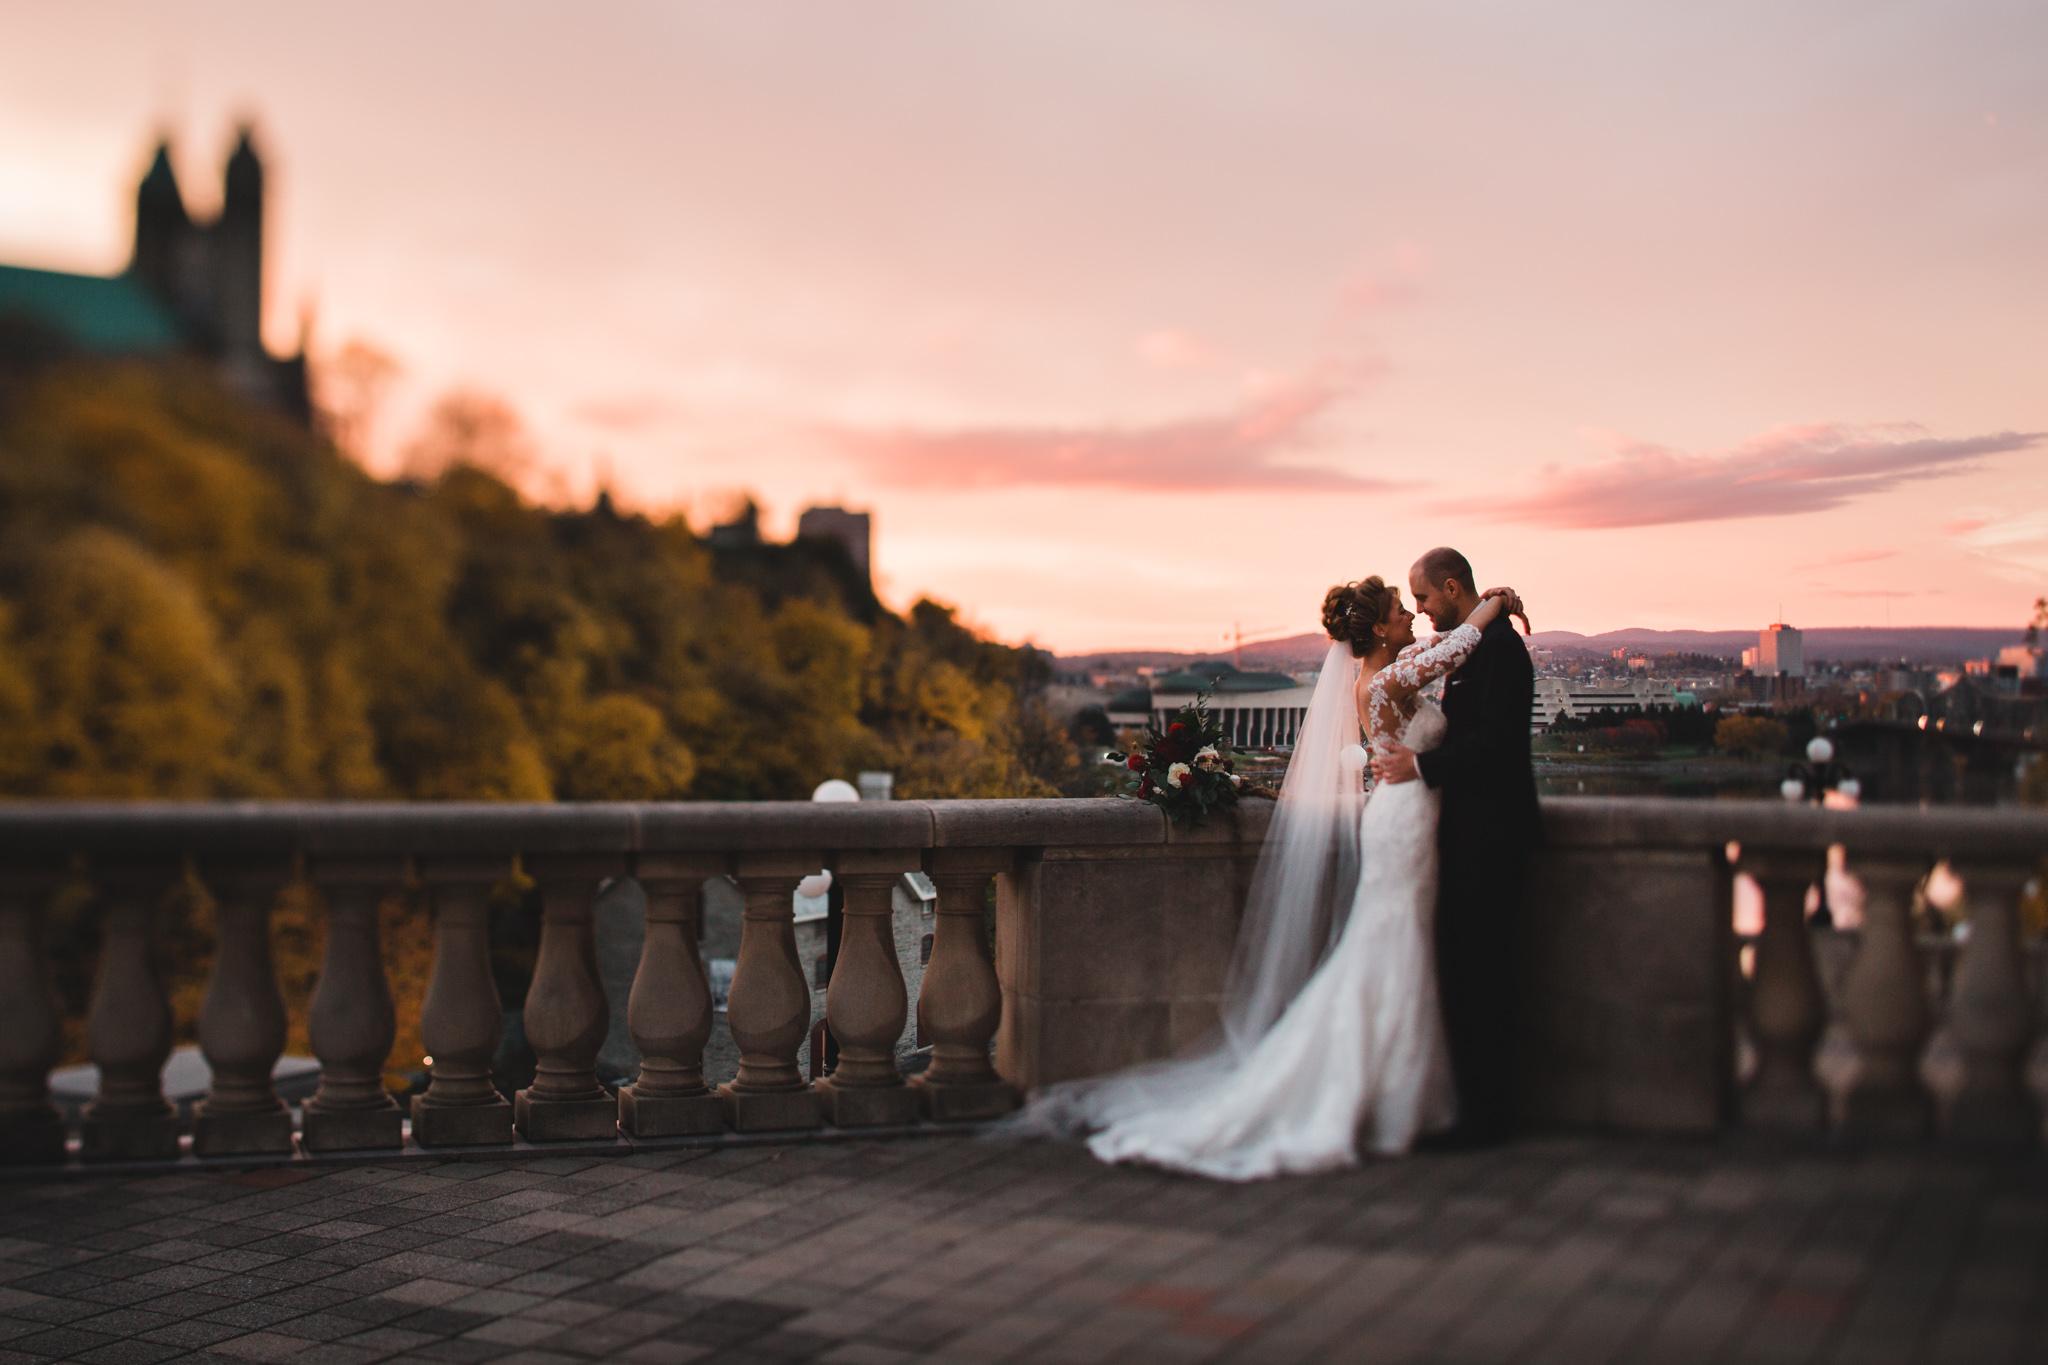 Chateau Laurier Sunset wedding portrait Jonathan Kuhn